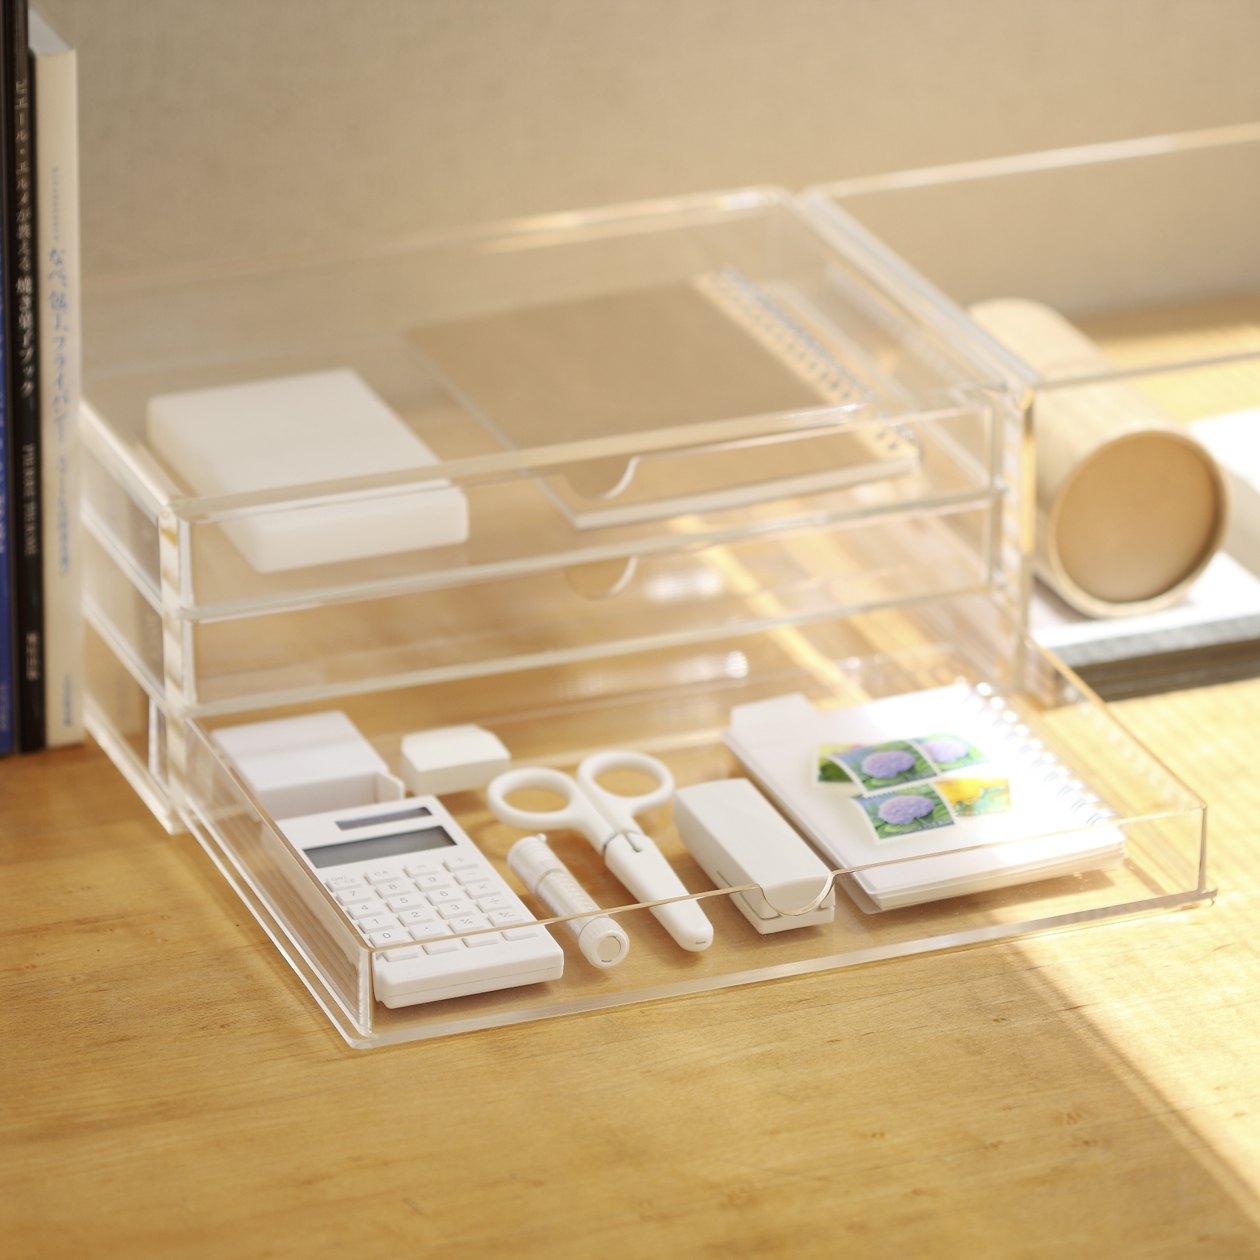 Desktop Organizers / Muji